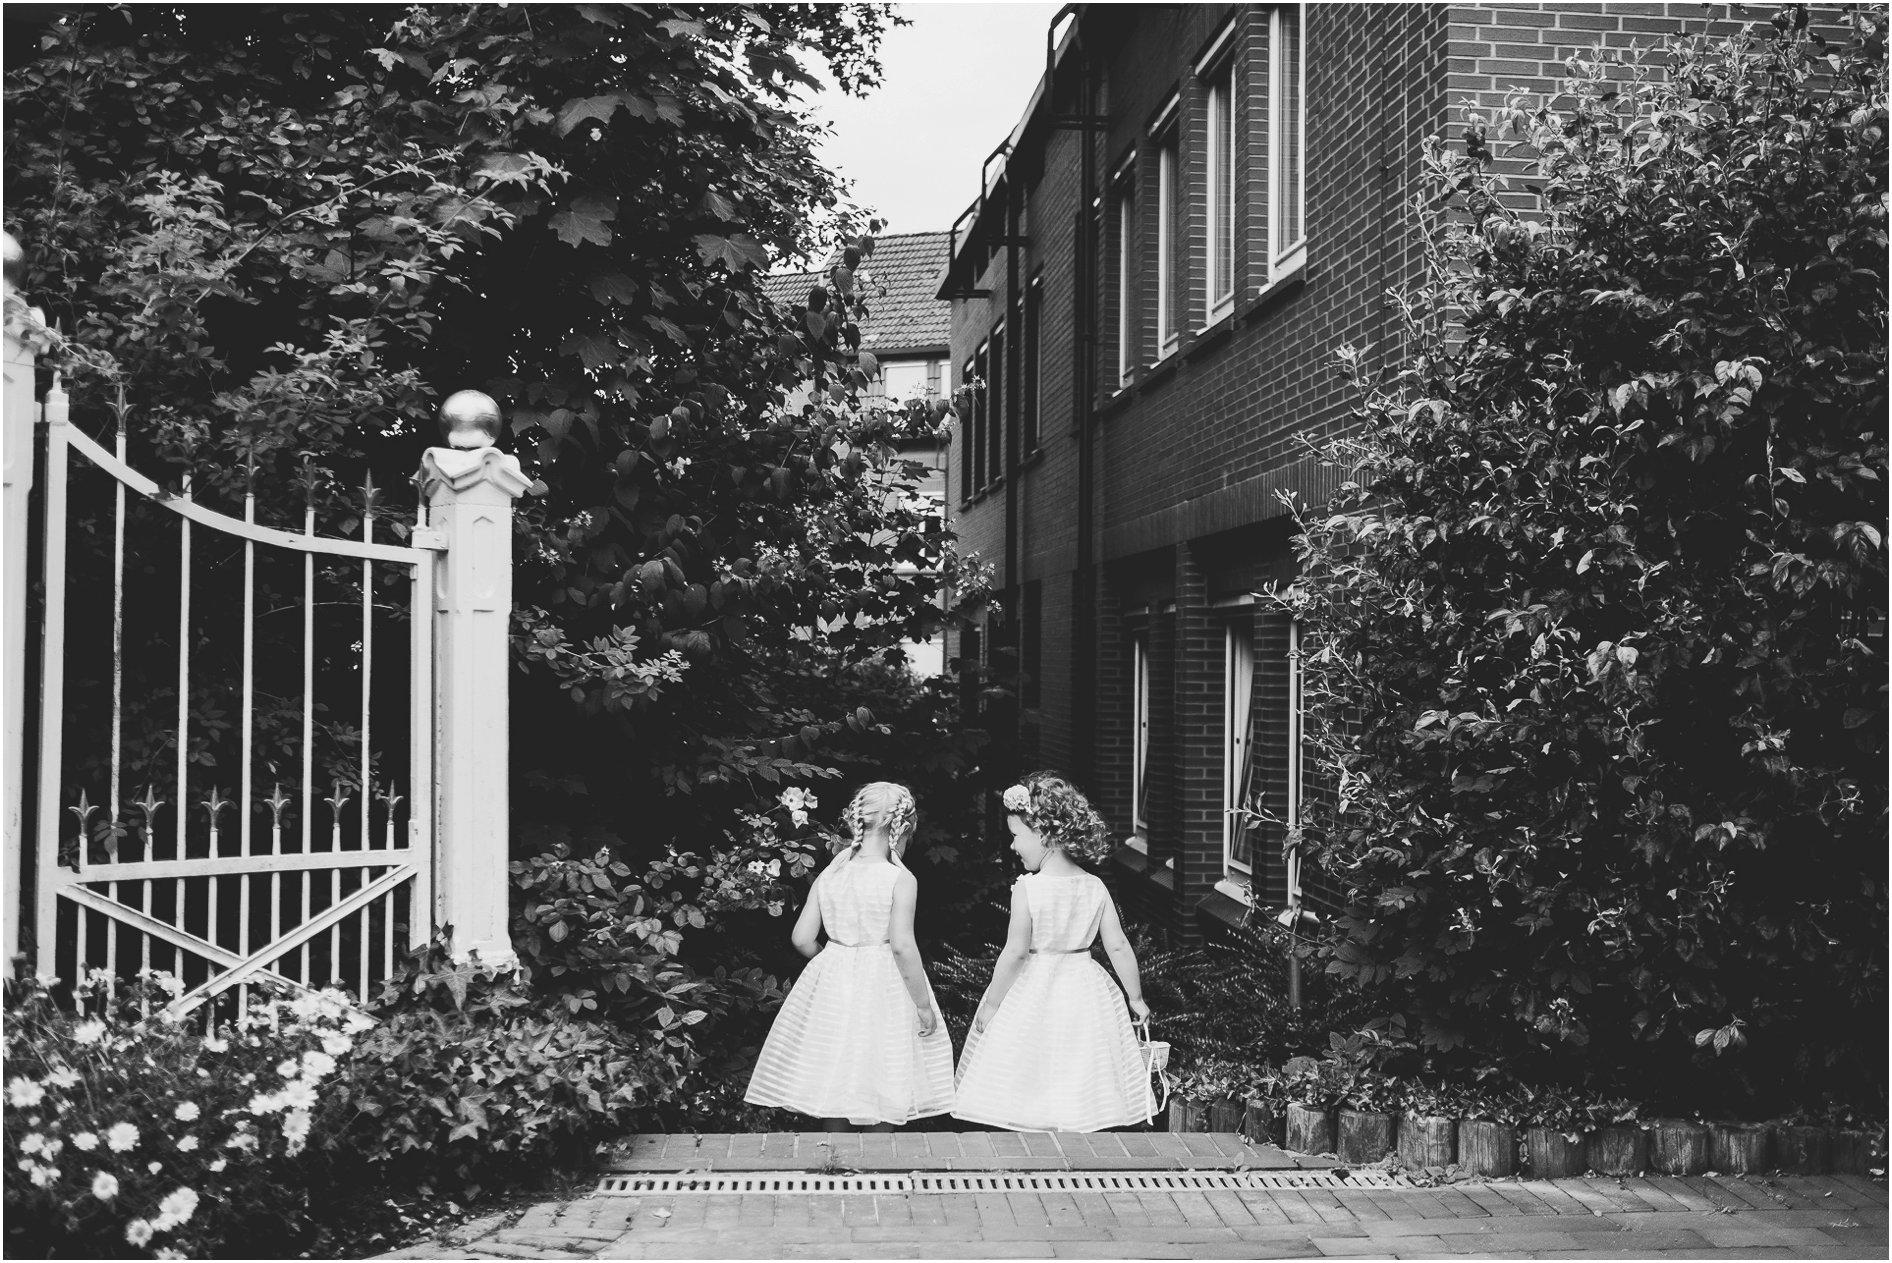 2016-04-19_0017 Sandra & Janis - Hochzeitsfotograf in Seevetal